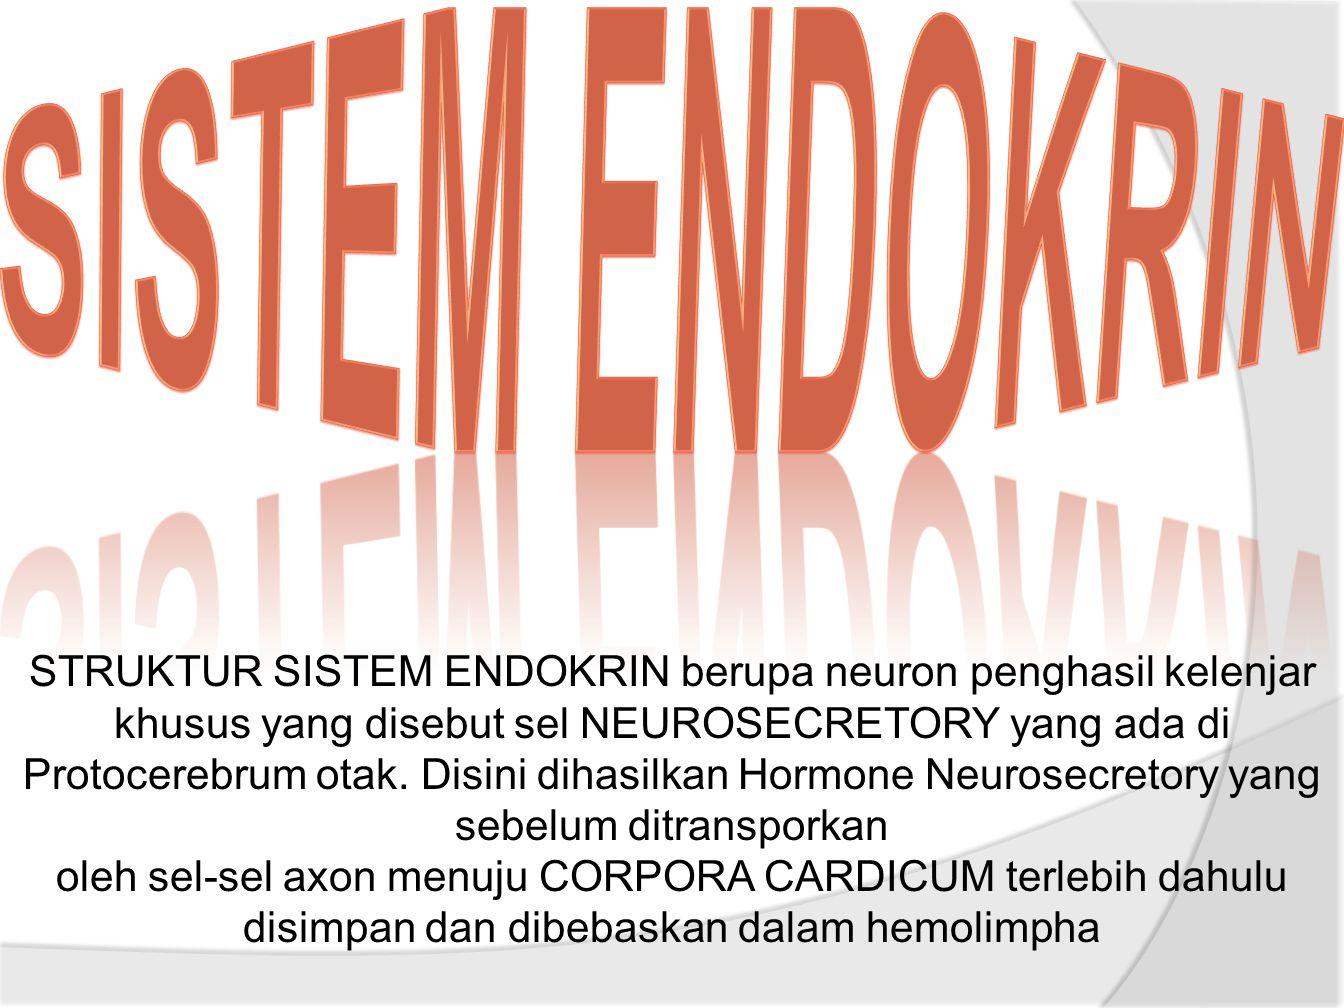 STRUKTUR SISTEM ENDOKRIN berupa neuron penghasil kelenjar khusus yang disebut sel NEUROSECRETORY yang ada di Protocerebrum otak.